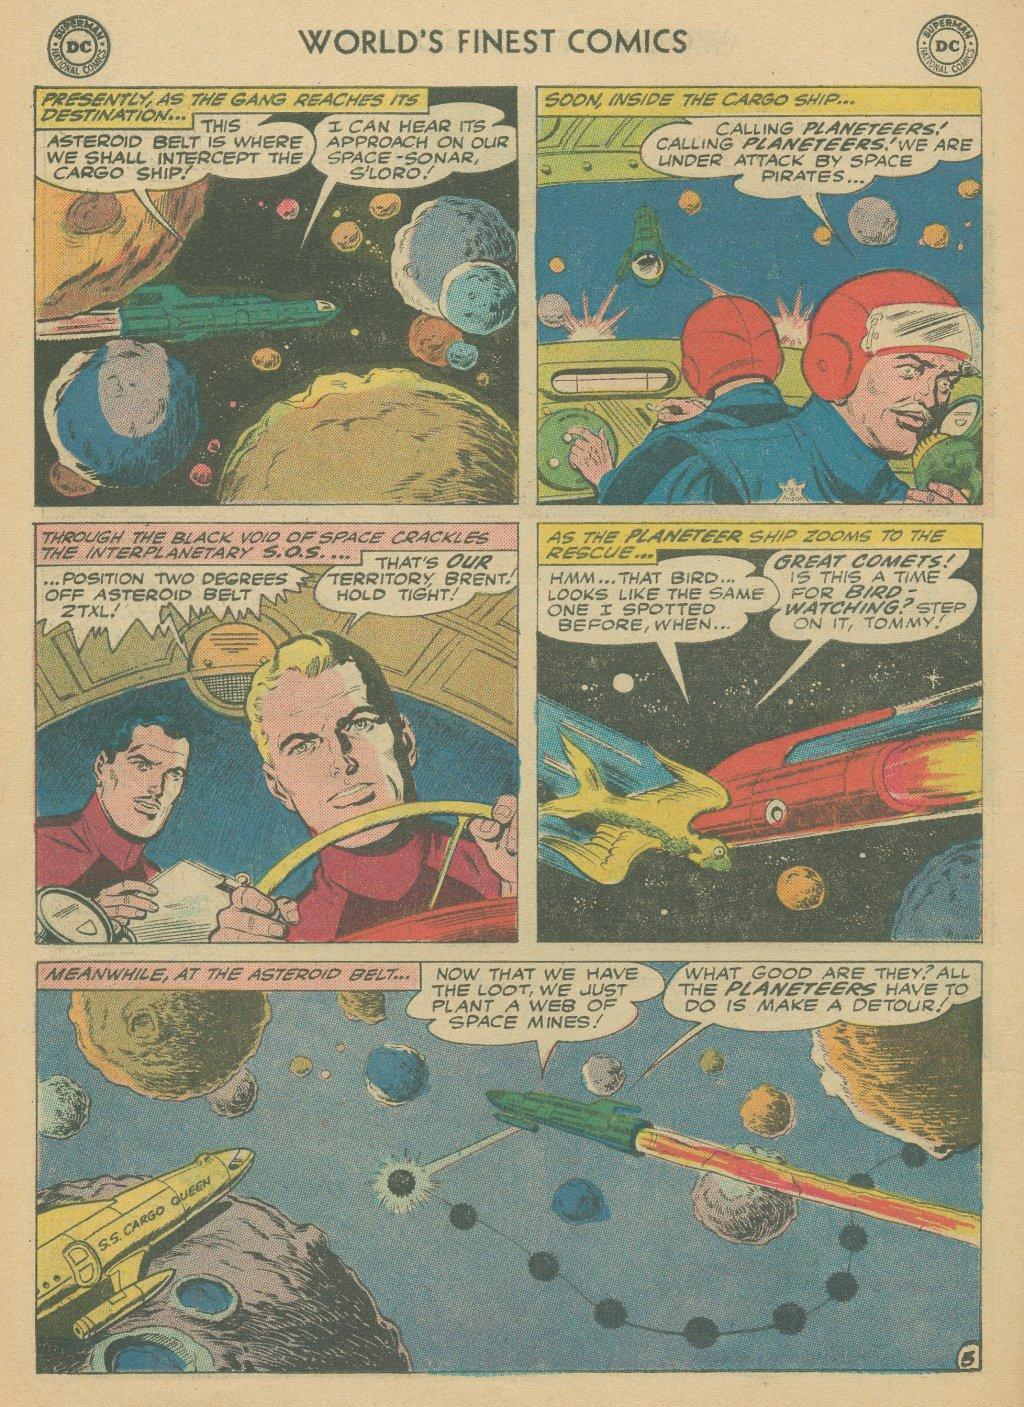 Read online World's Finest Comics comic -  Issue #108 - 22